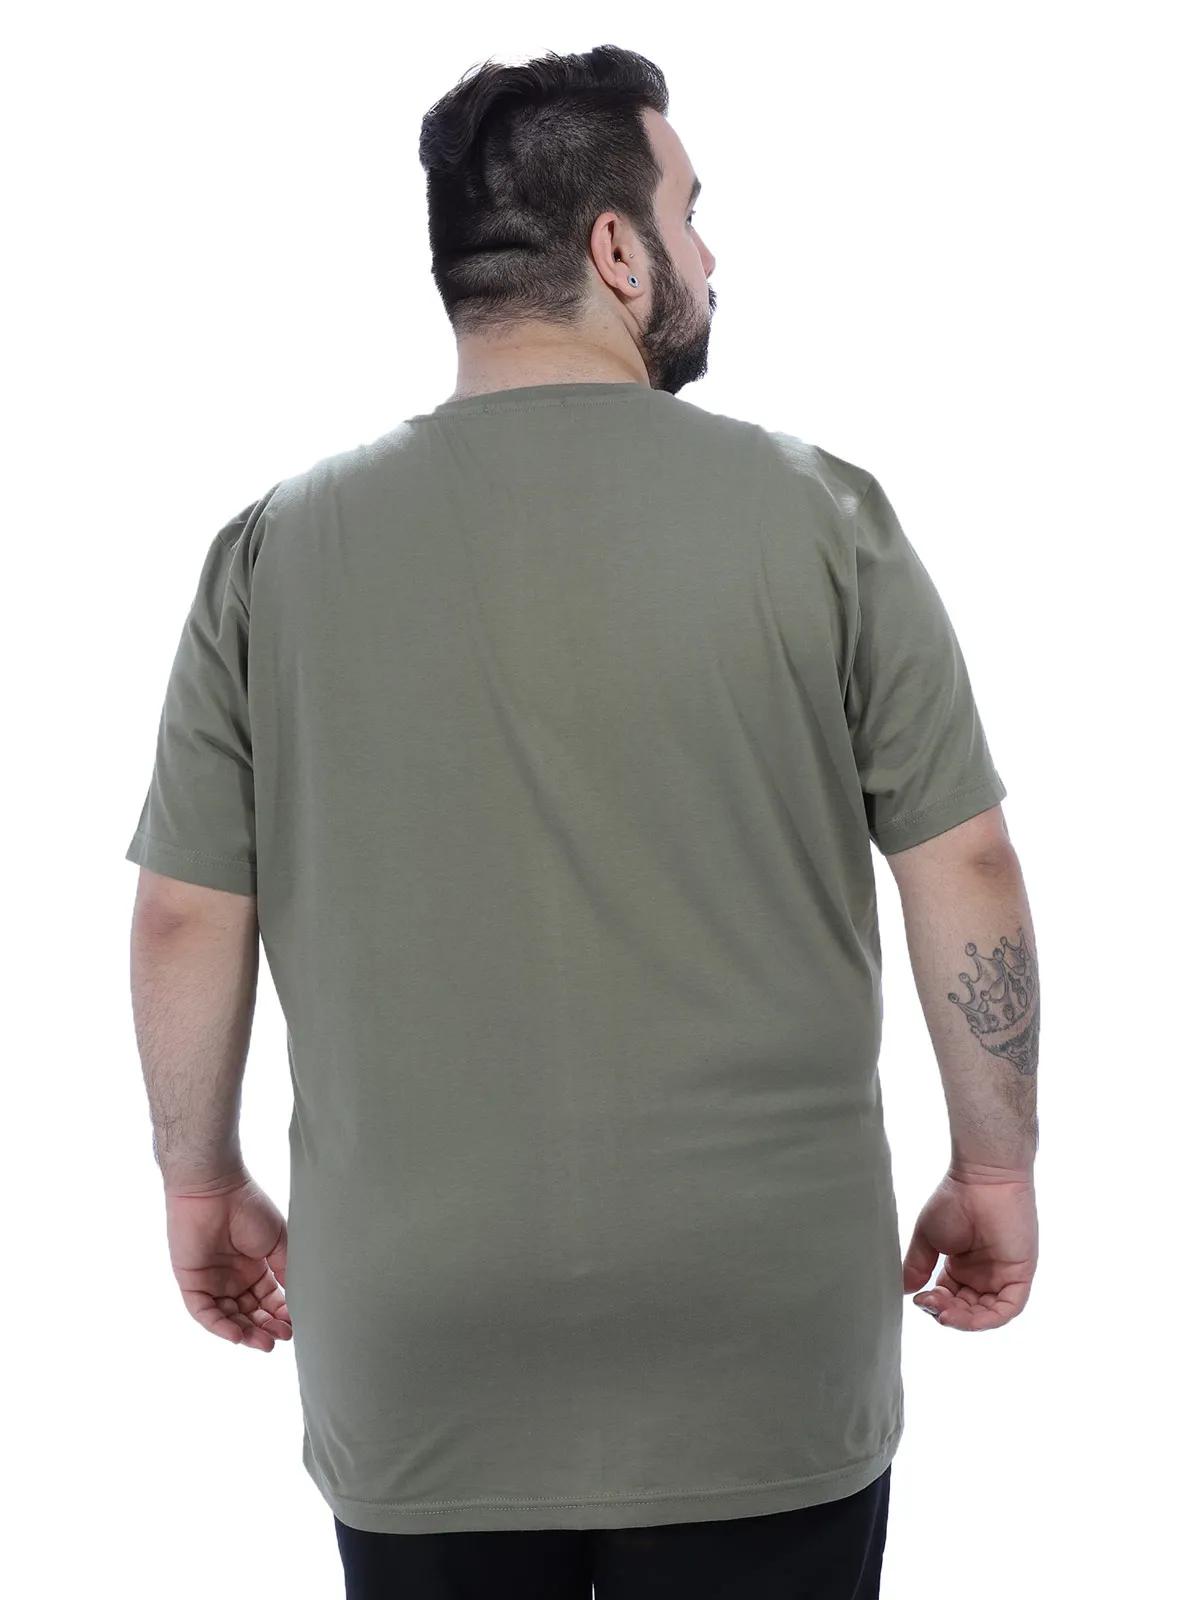 Camiseta Plus Size Masculino Manga Curta Gola Careca Bambú